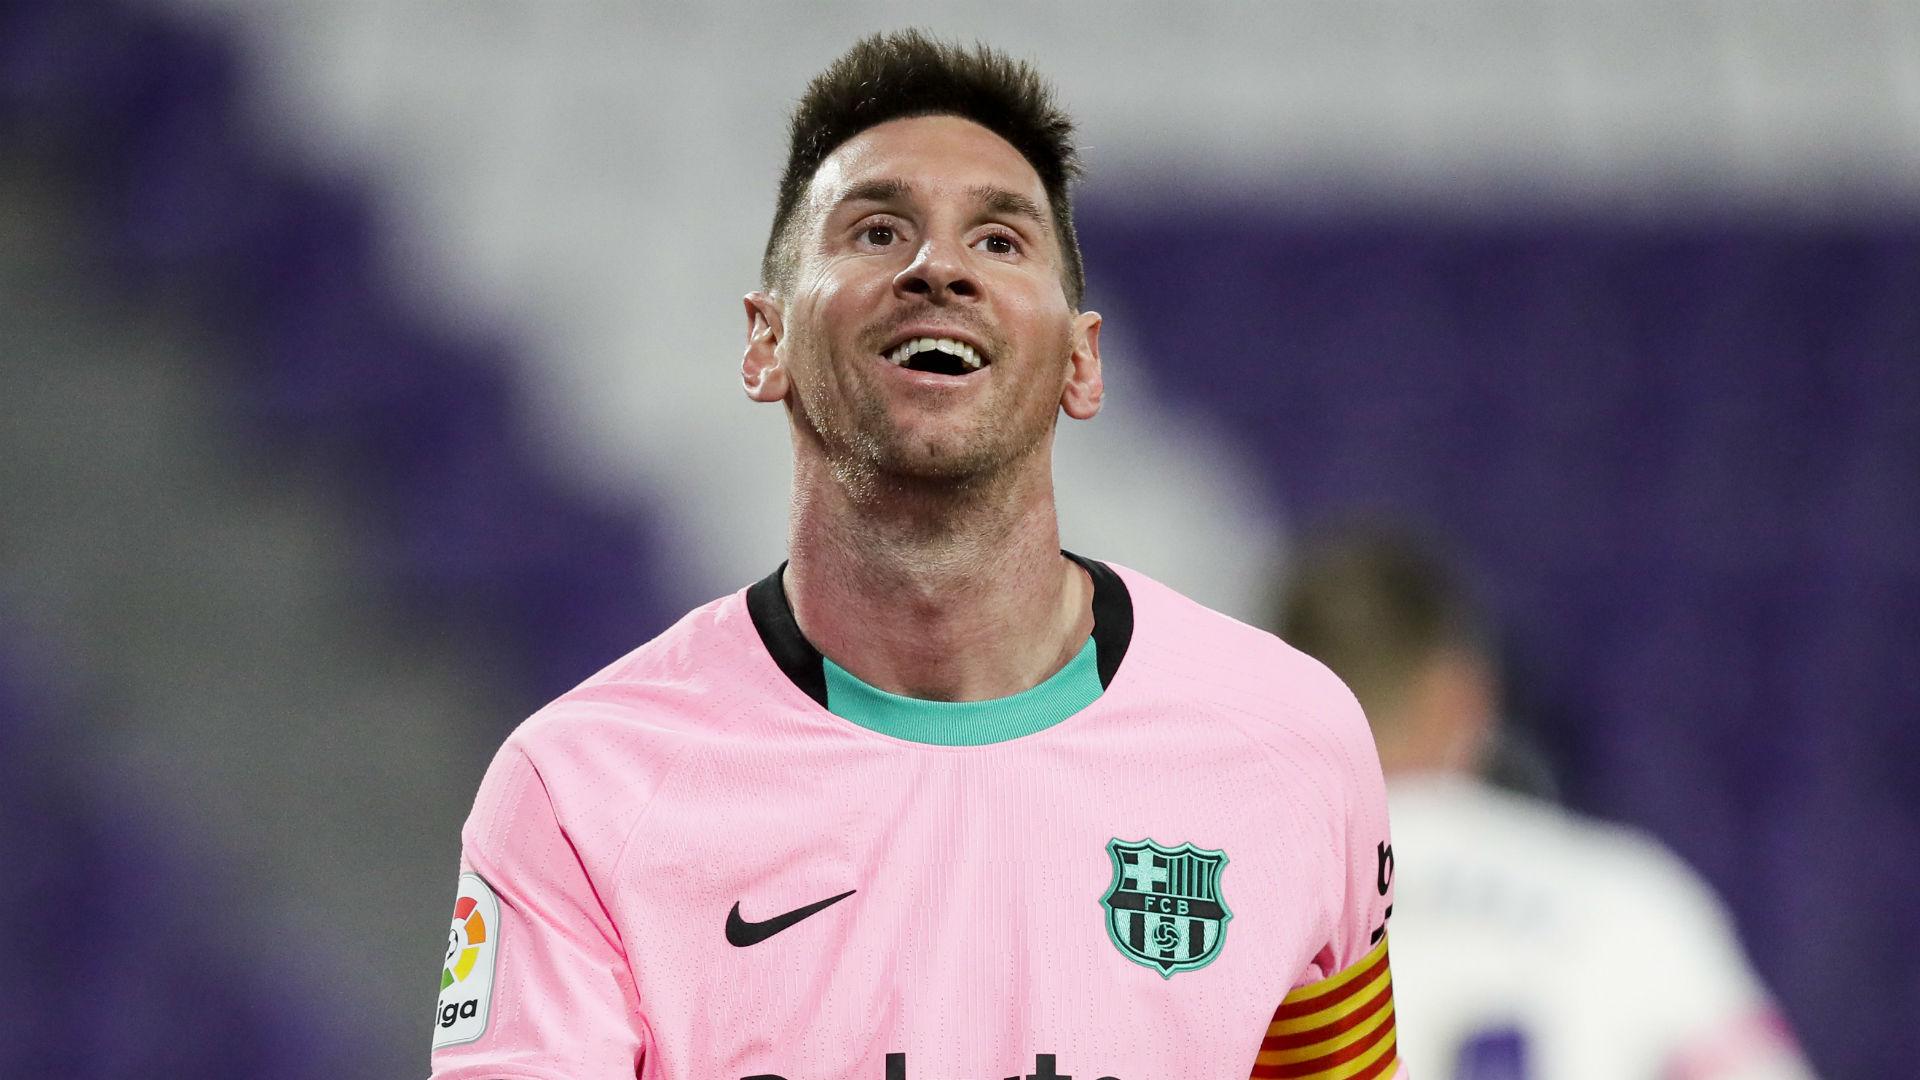 Rayo Vallecano 1-2 Barcelona: Messi and De Jong seal Copa del Rey progress